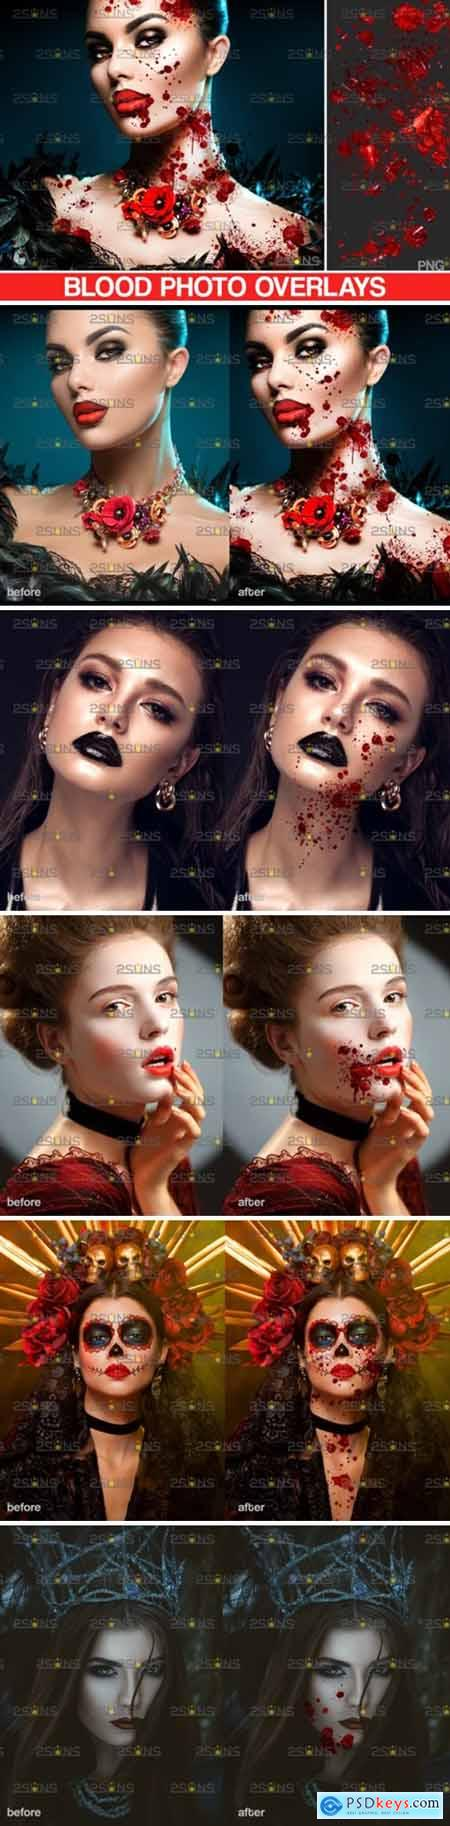 Blood Splatter Photoshop Overlay V7 5023851